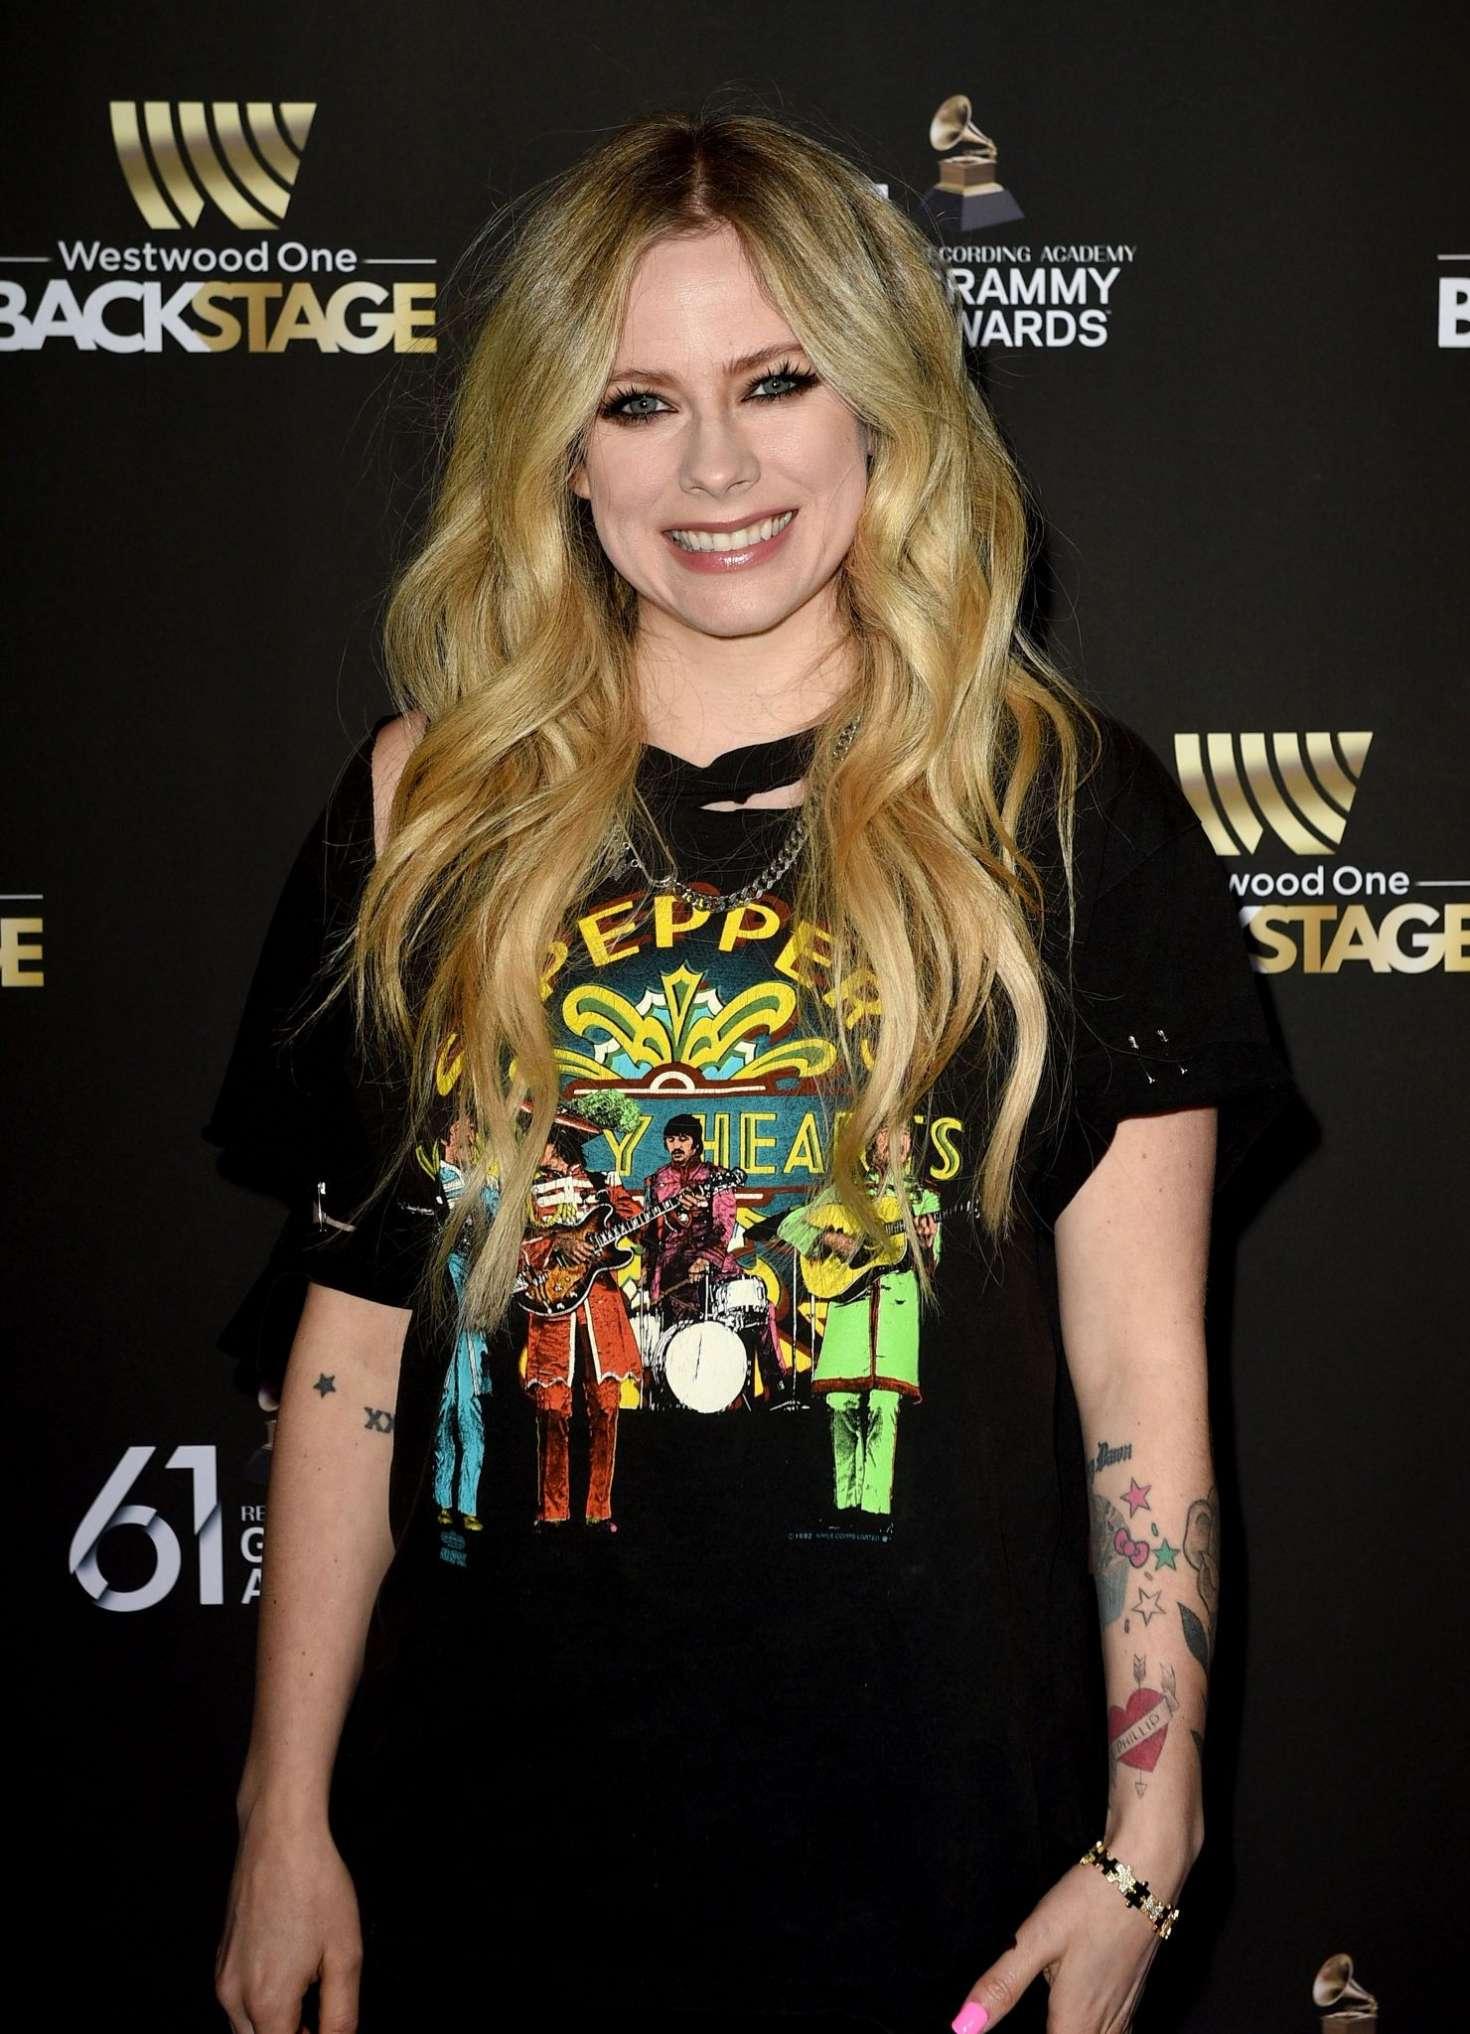 Avril Lavigne - Westwood One Radio Roundtables in LA